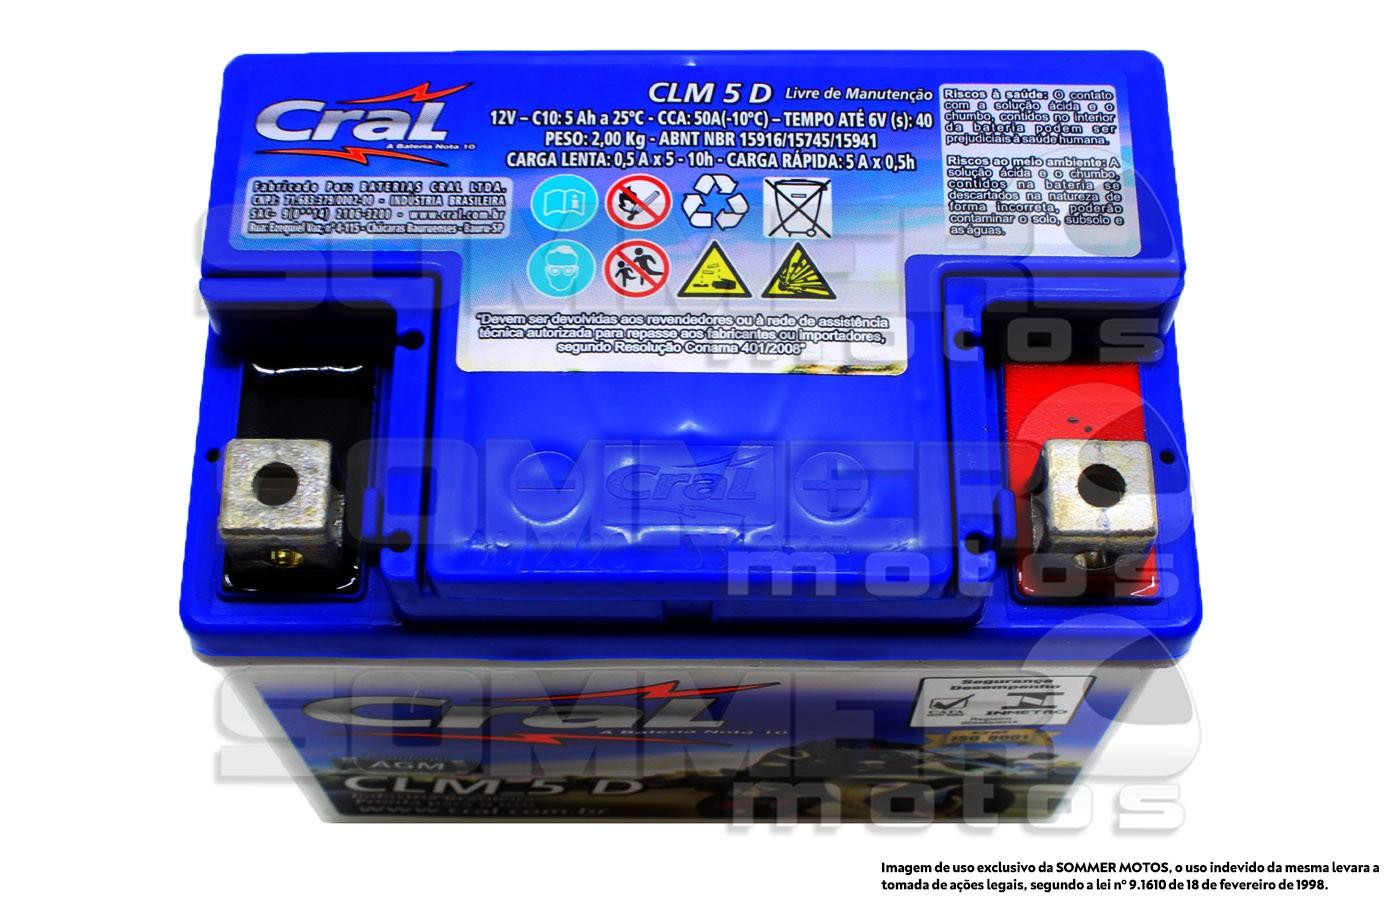 BATERIA XLR 125 2000 A 2002- NXR 125/150 BROS KS ORIGINAL CRAL (CLM5D-YTX5LBS)